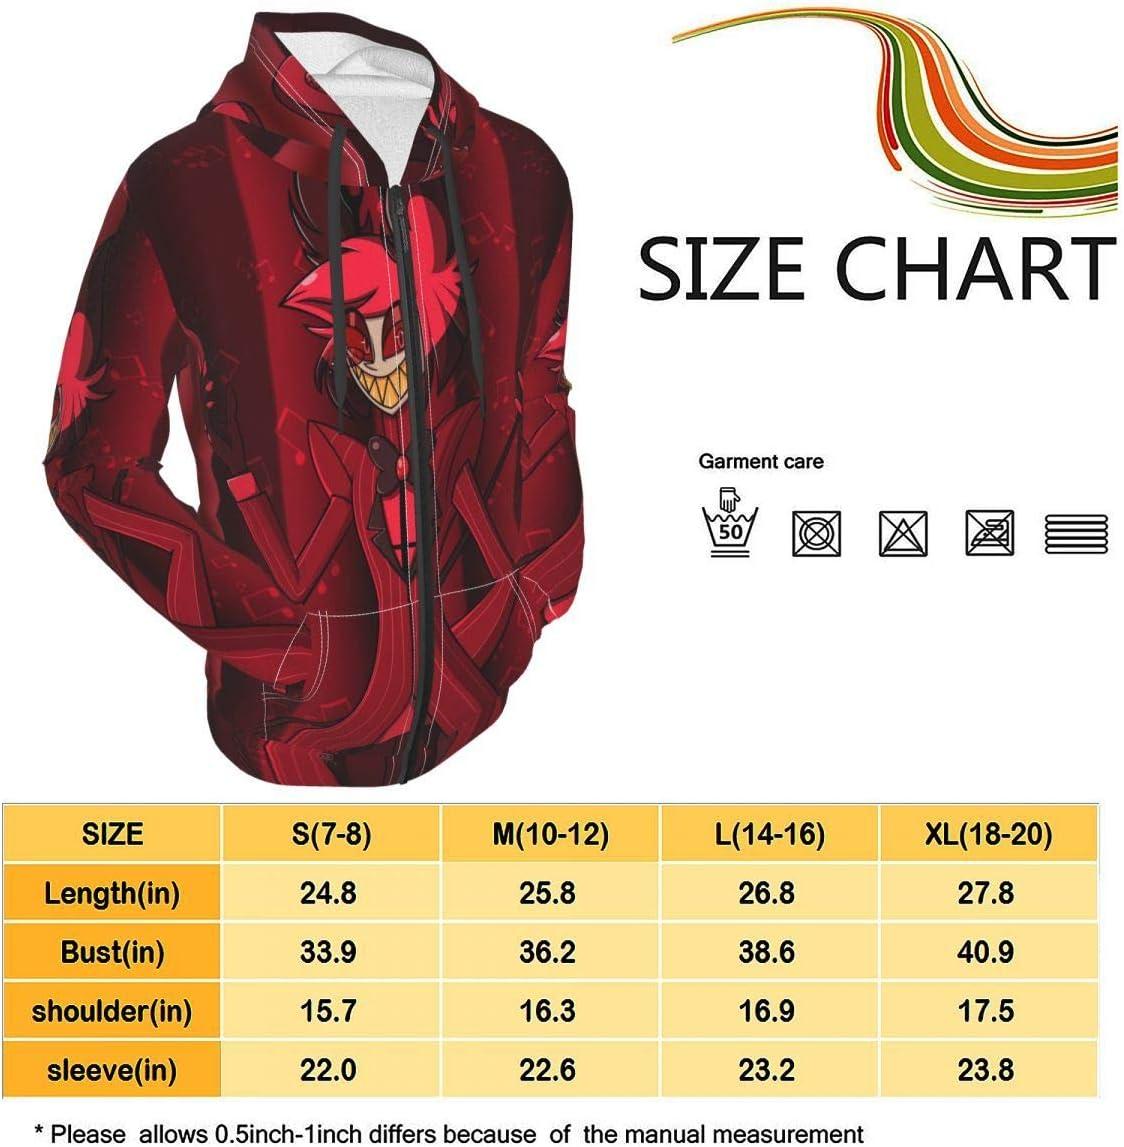 Unisex Teens Top Hazbin Hotel Q Hoodies Sweatshirt Fashion Hoodie Zip Hooded for Youth Boys/Girls 14-16 Years